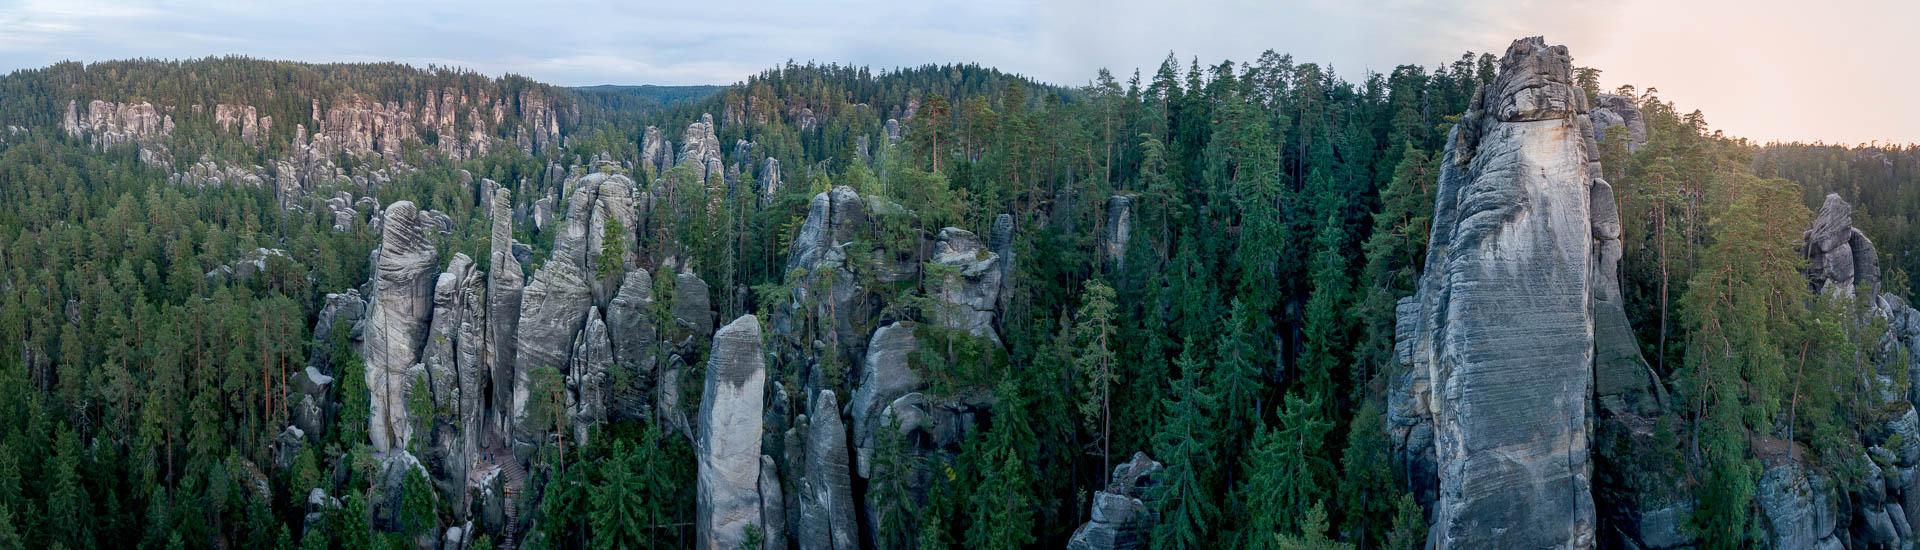 klimmen Tsjechië Adrspach panorama foto Frank Penders